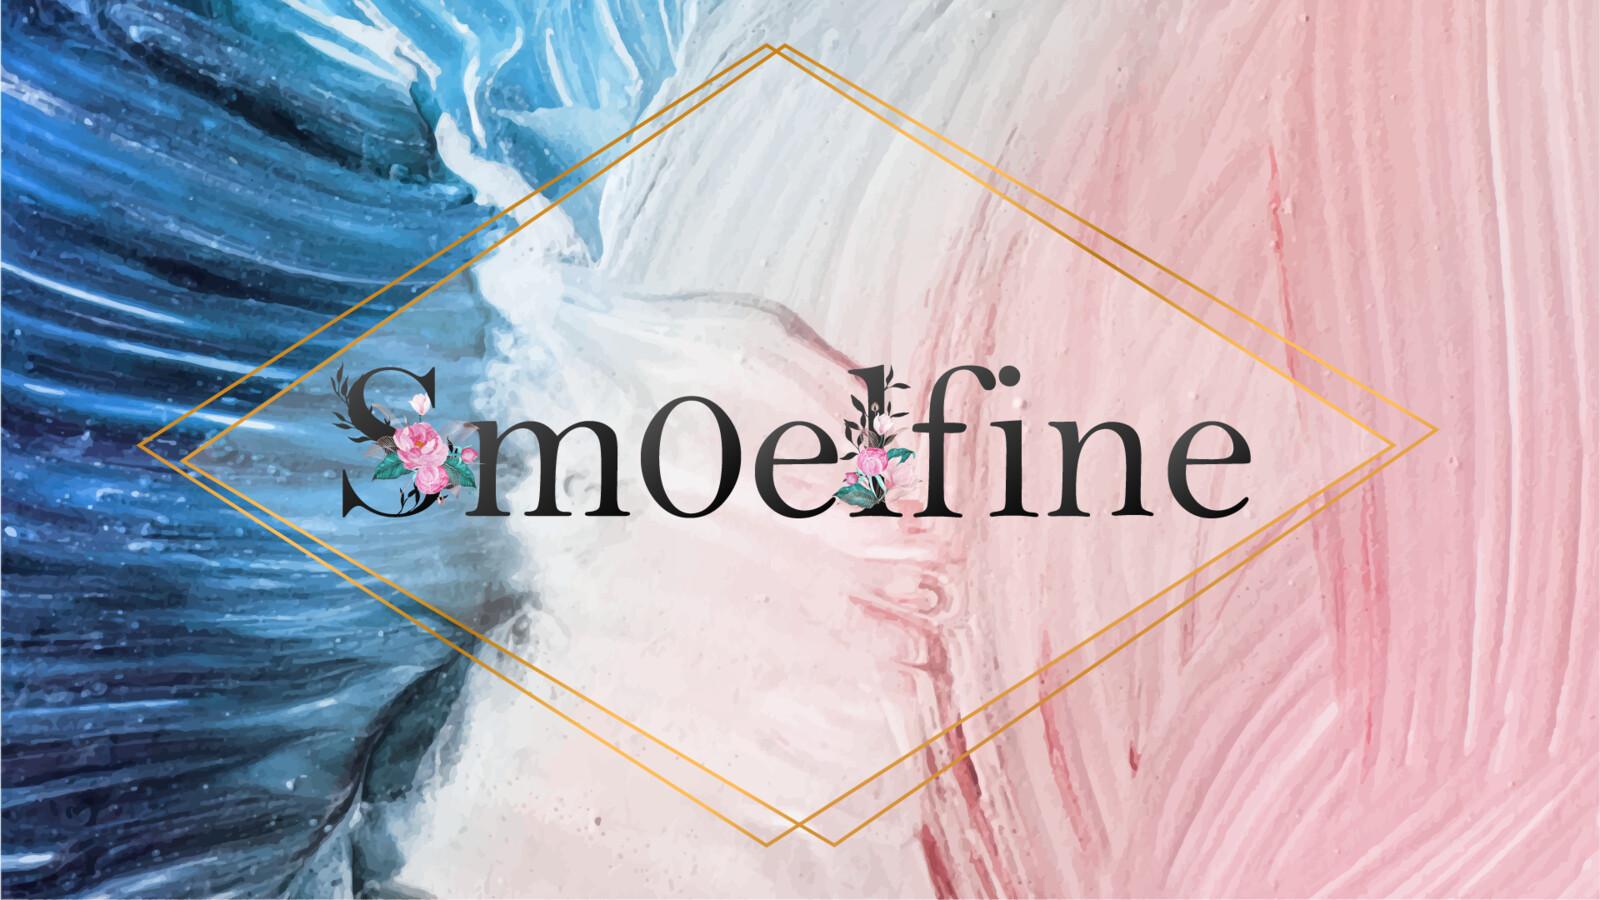 Sm0elfine